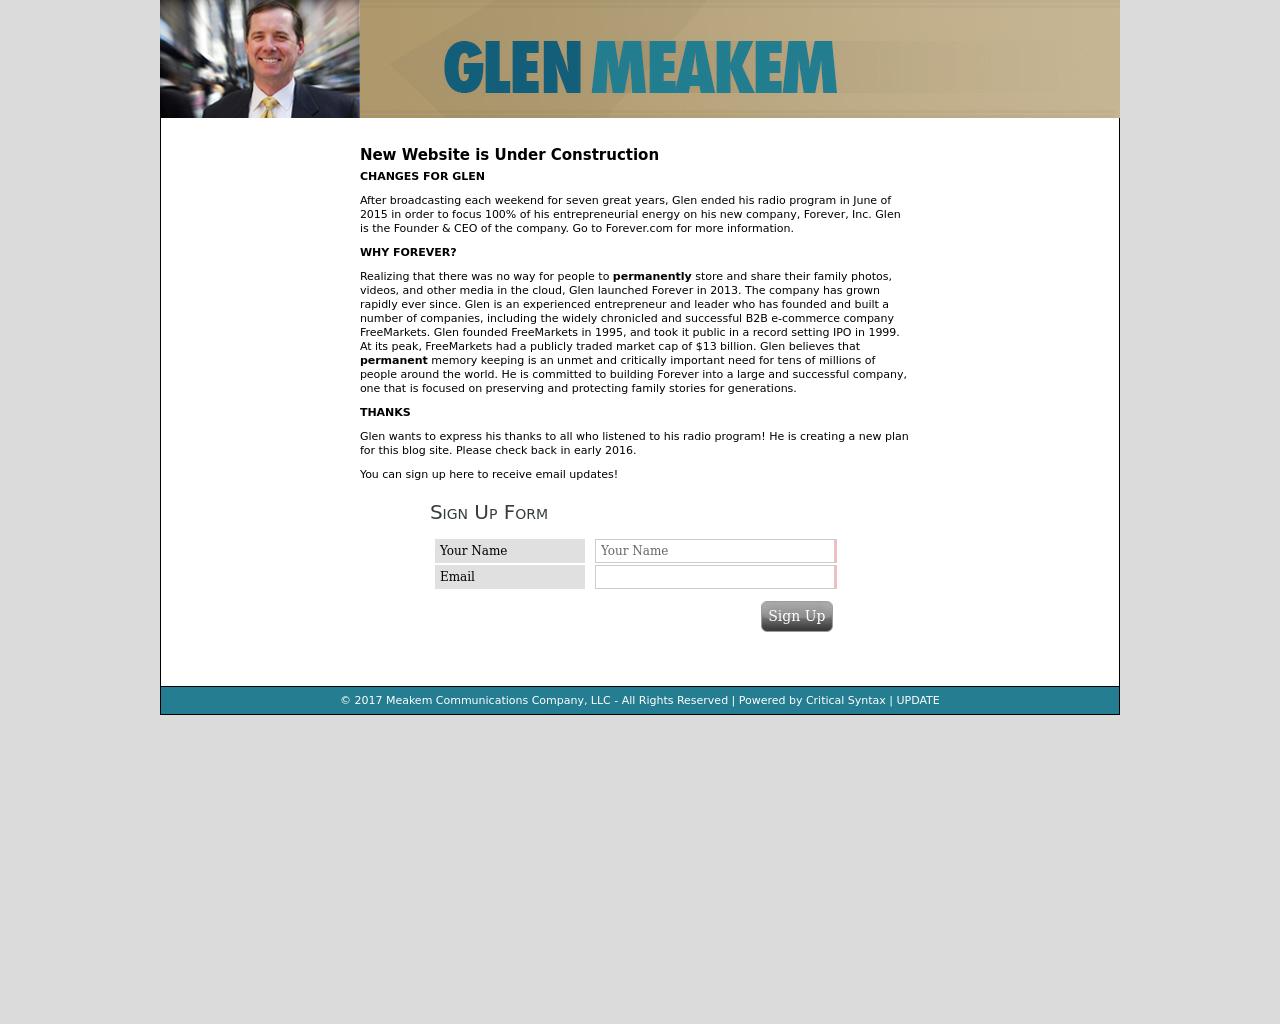 Glen-Meakem-Conservative-Insight-Advertising-Reviews-Pricing